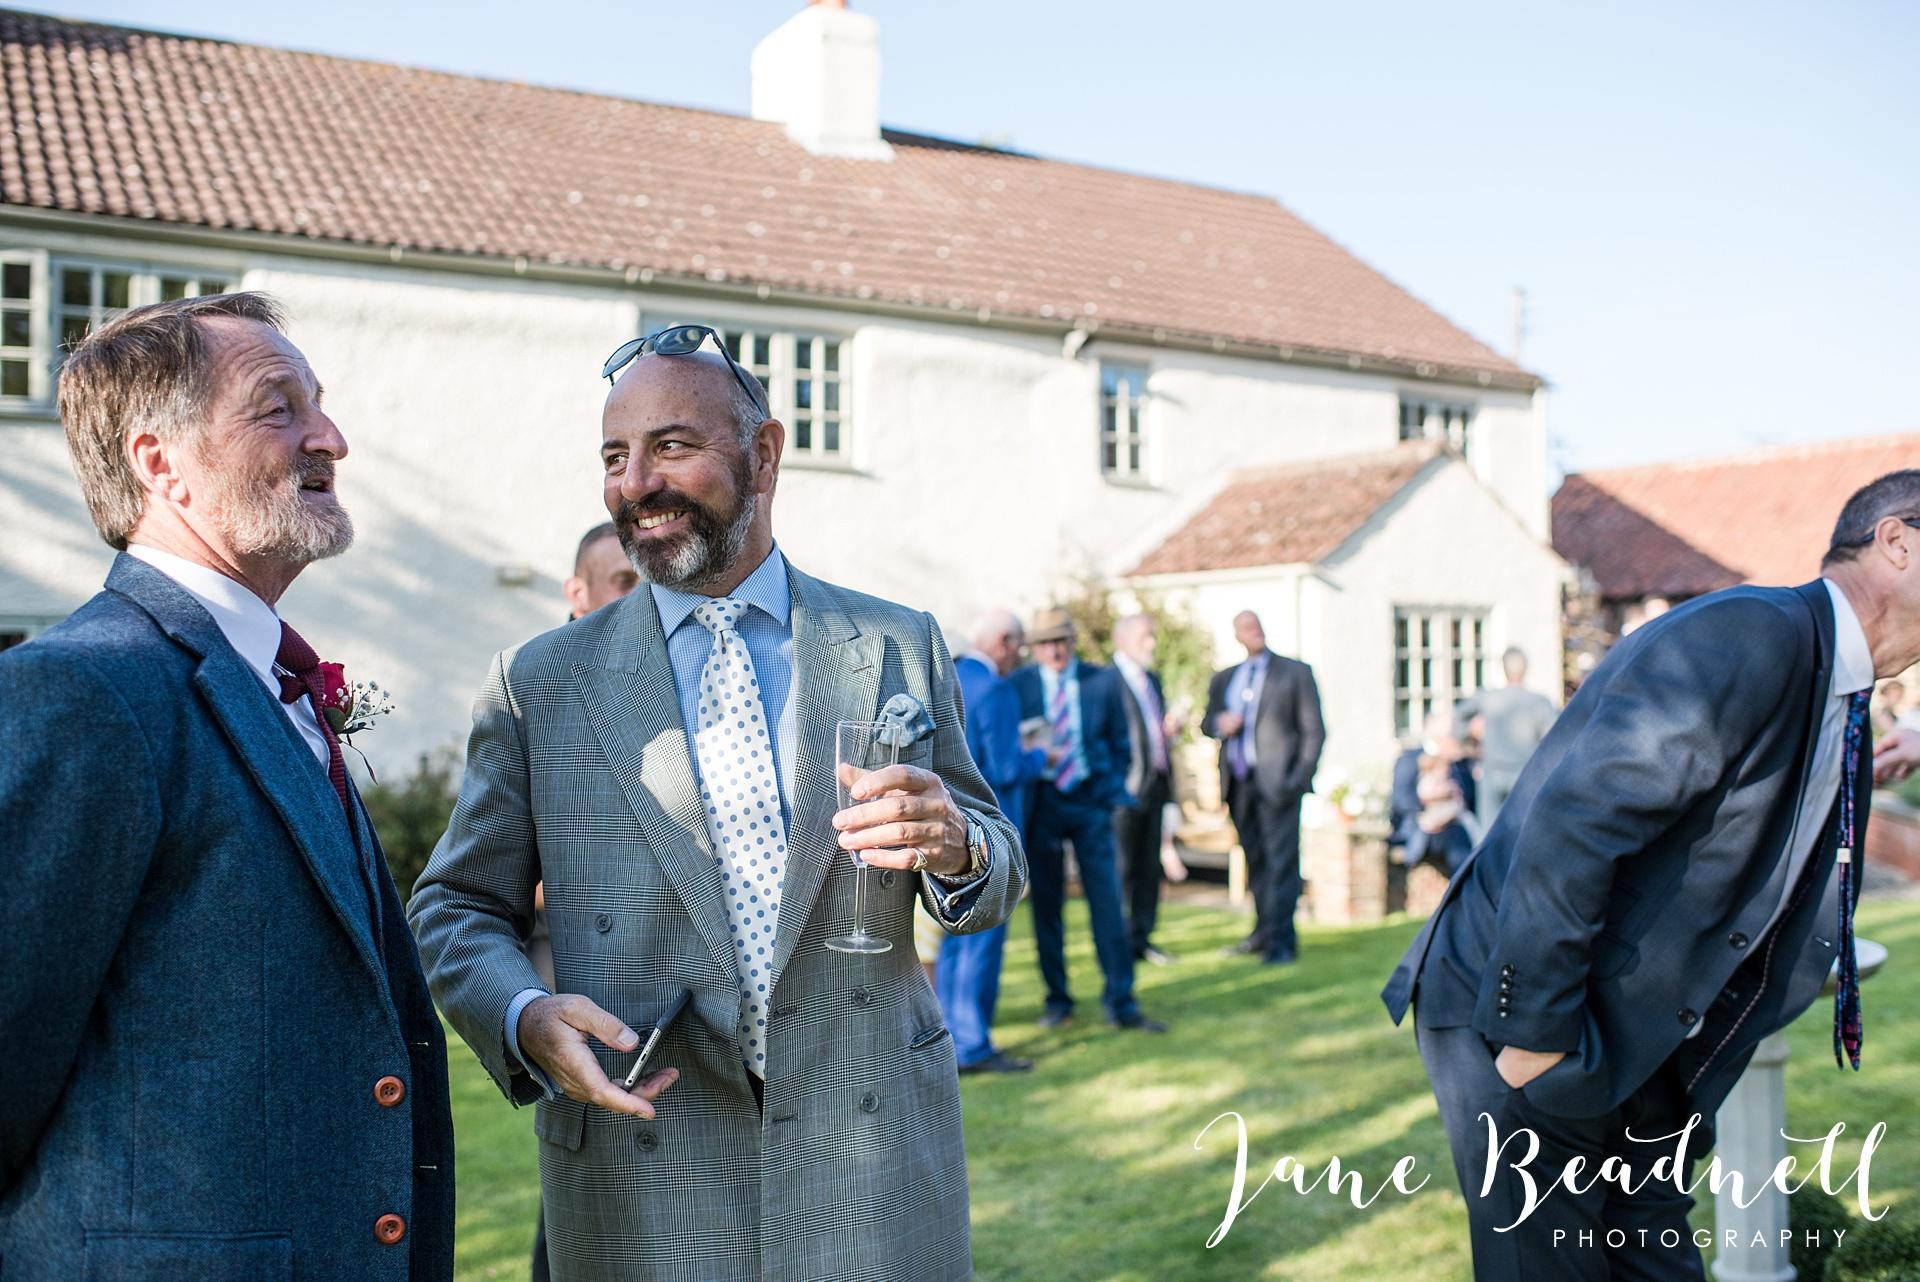 fine-art-wedding-photographer-jane-beadnell-yorkshire-wedding-photographer_0089